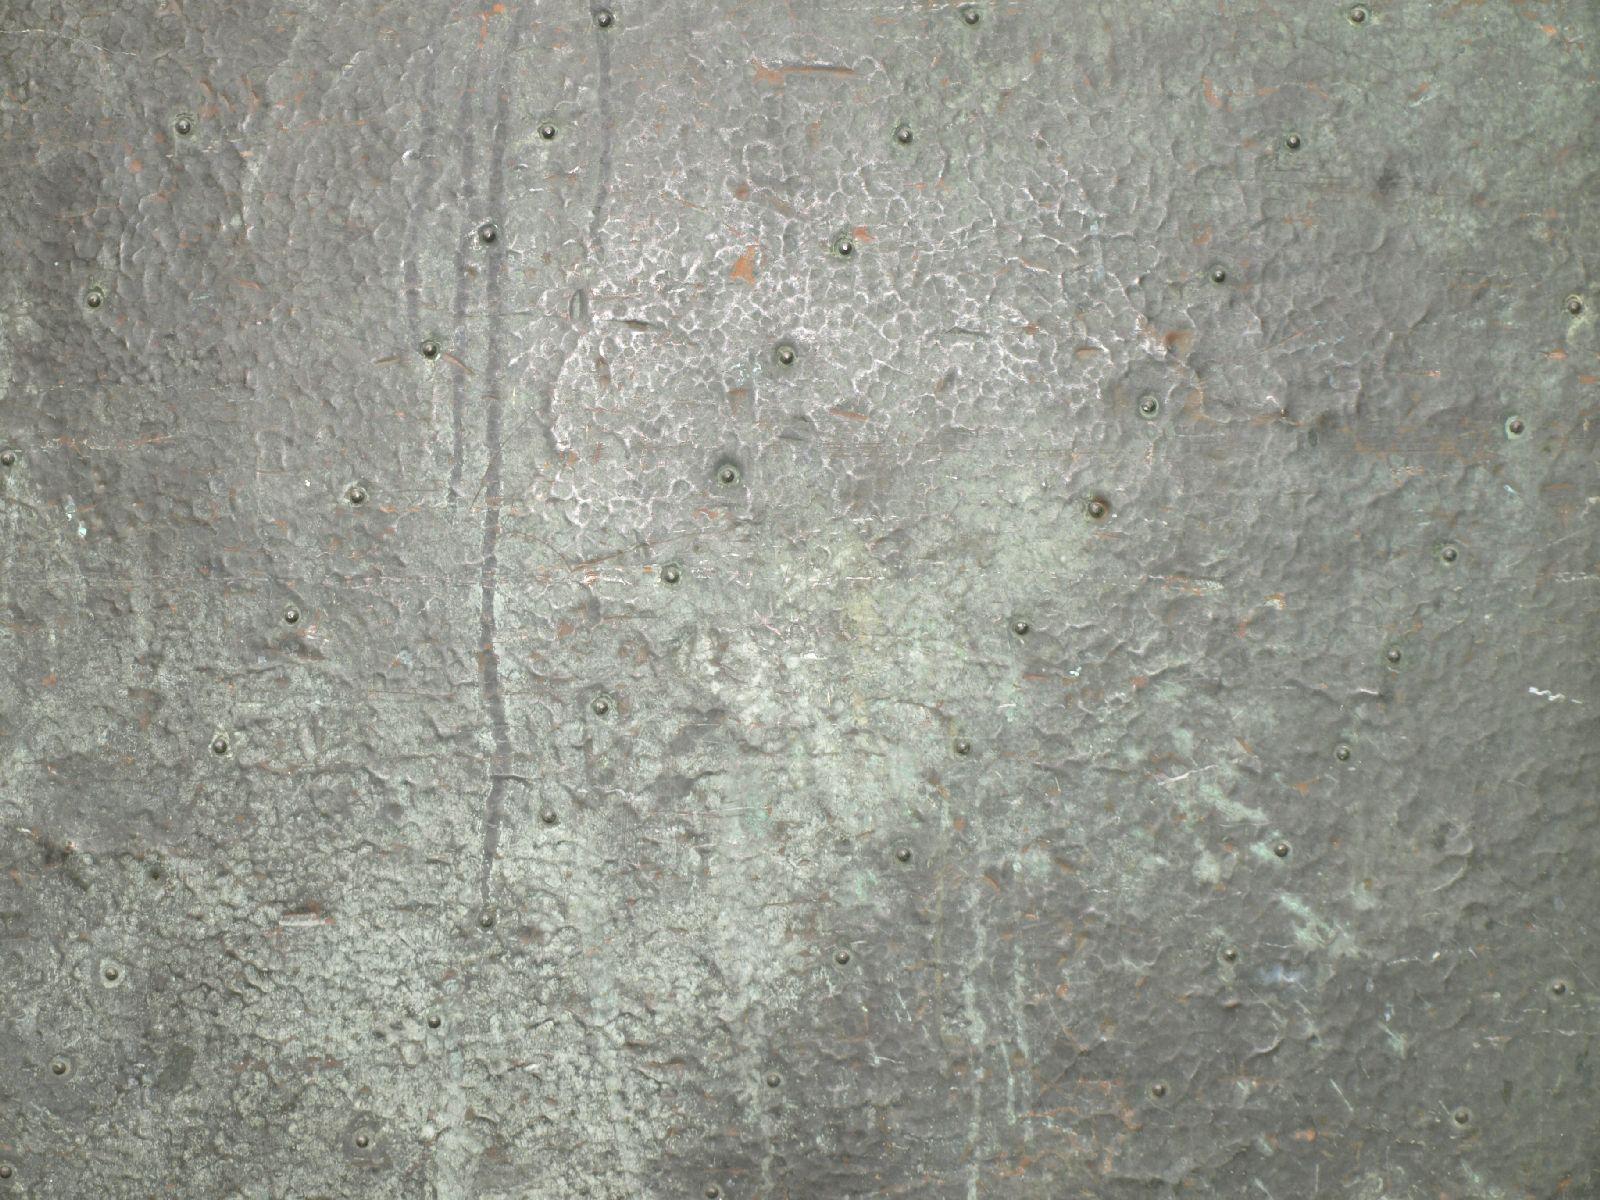 Metall_Textur_A_P4110613